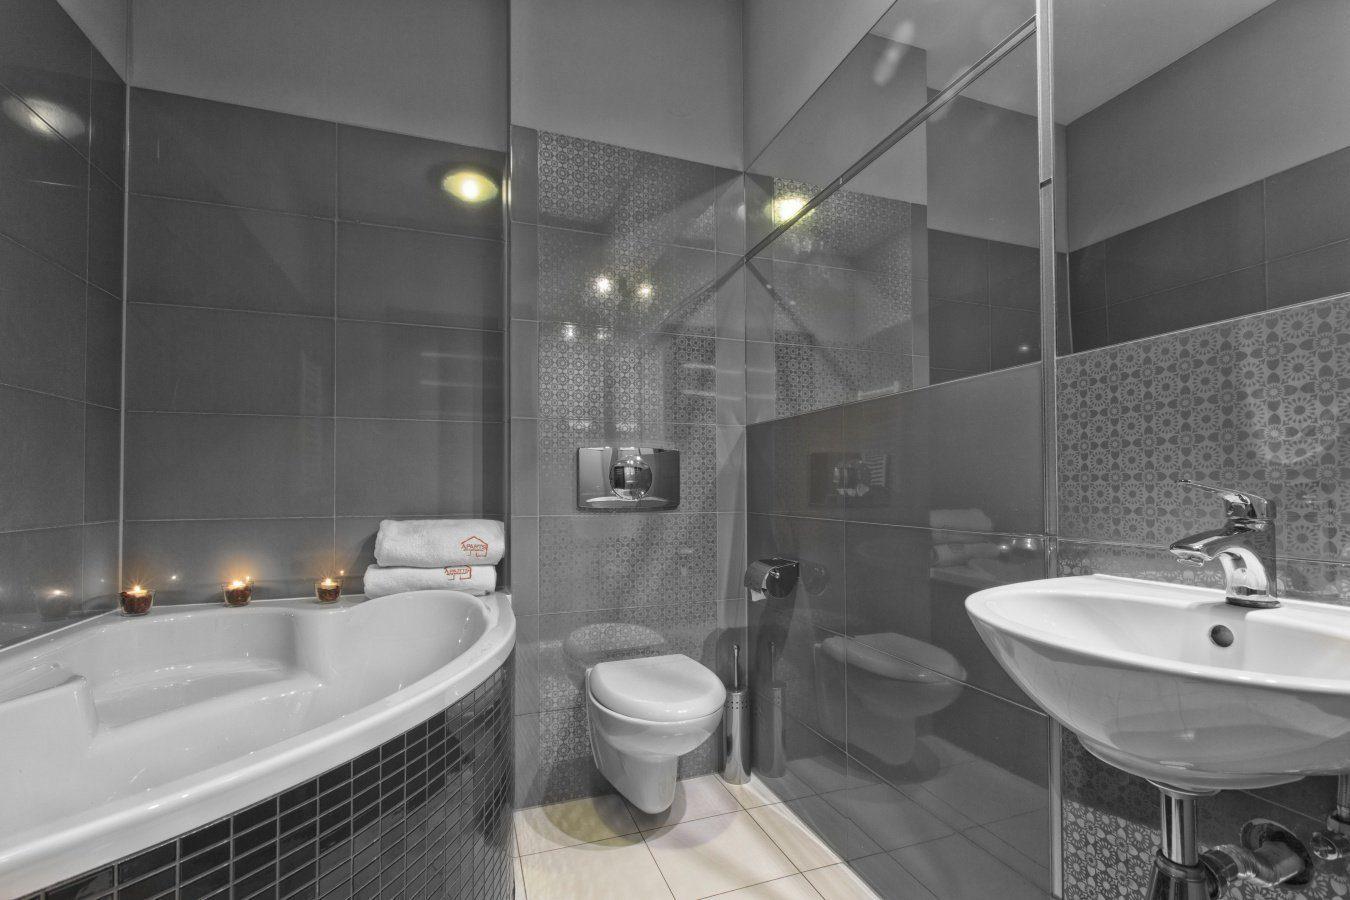 Bathroom at Zeligowskiego Apartments